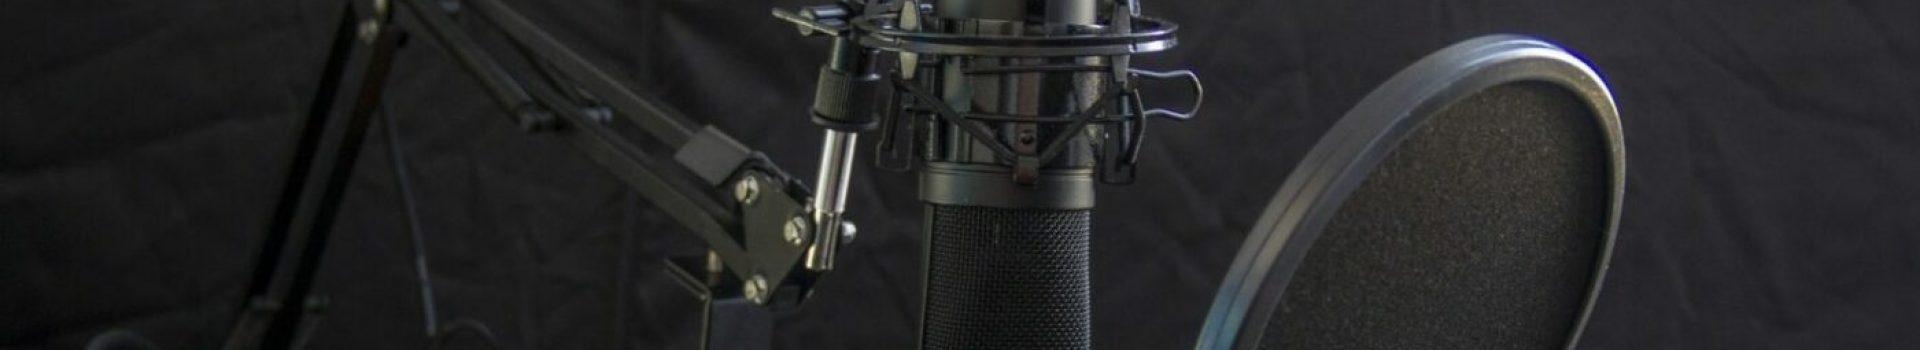 cropped-MaxPixel.freegreatpicture.com-Audio-Headset-Headphone-Microphone-Studio-Radio-616788-e1585723217719-5.jpg